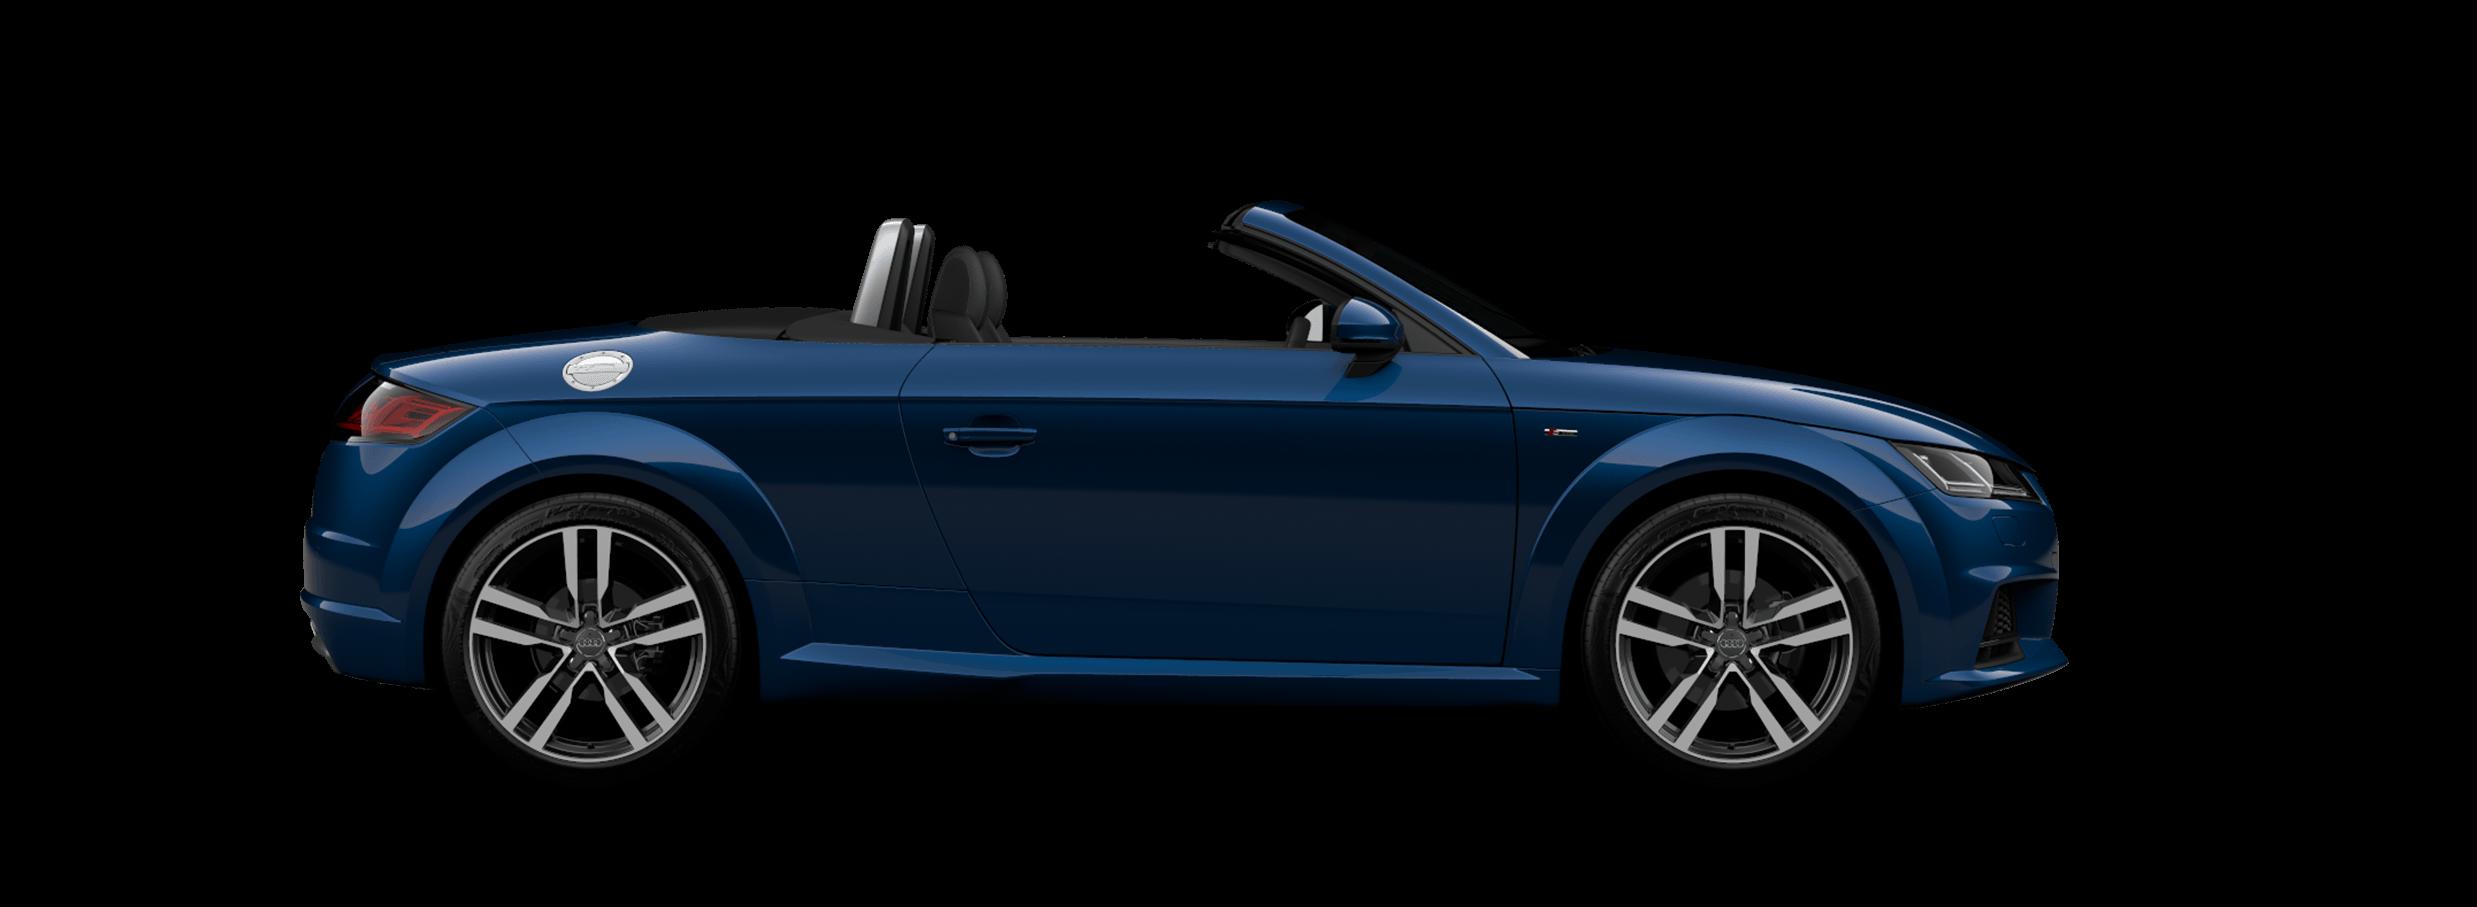 https://bluesky-cogcms.cdn.imgeng.in/media/62380/tt-roadster.png